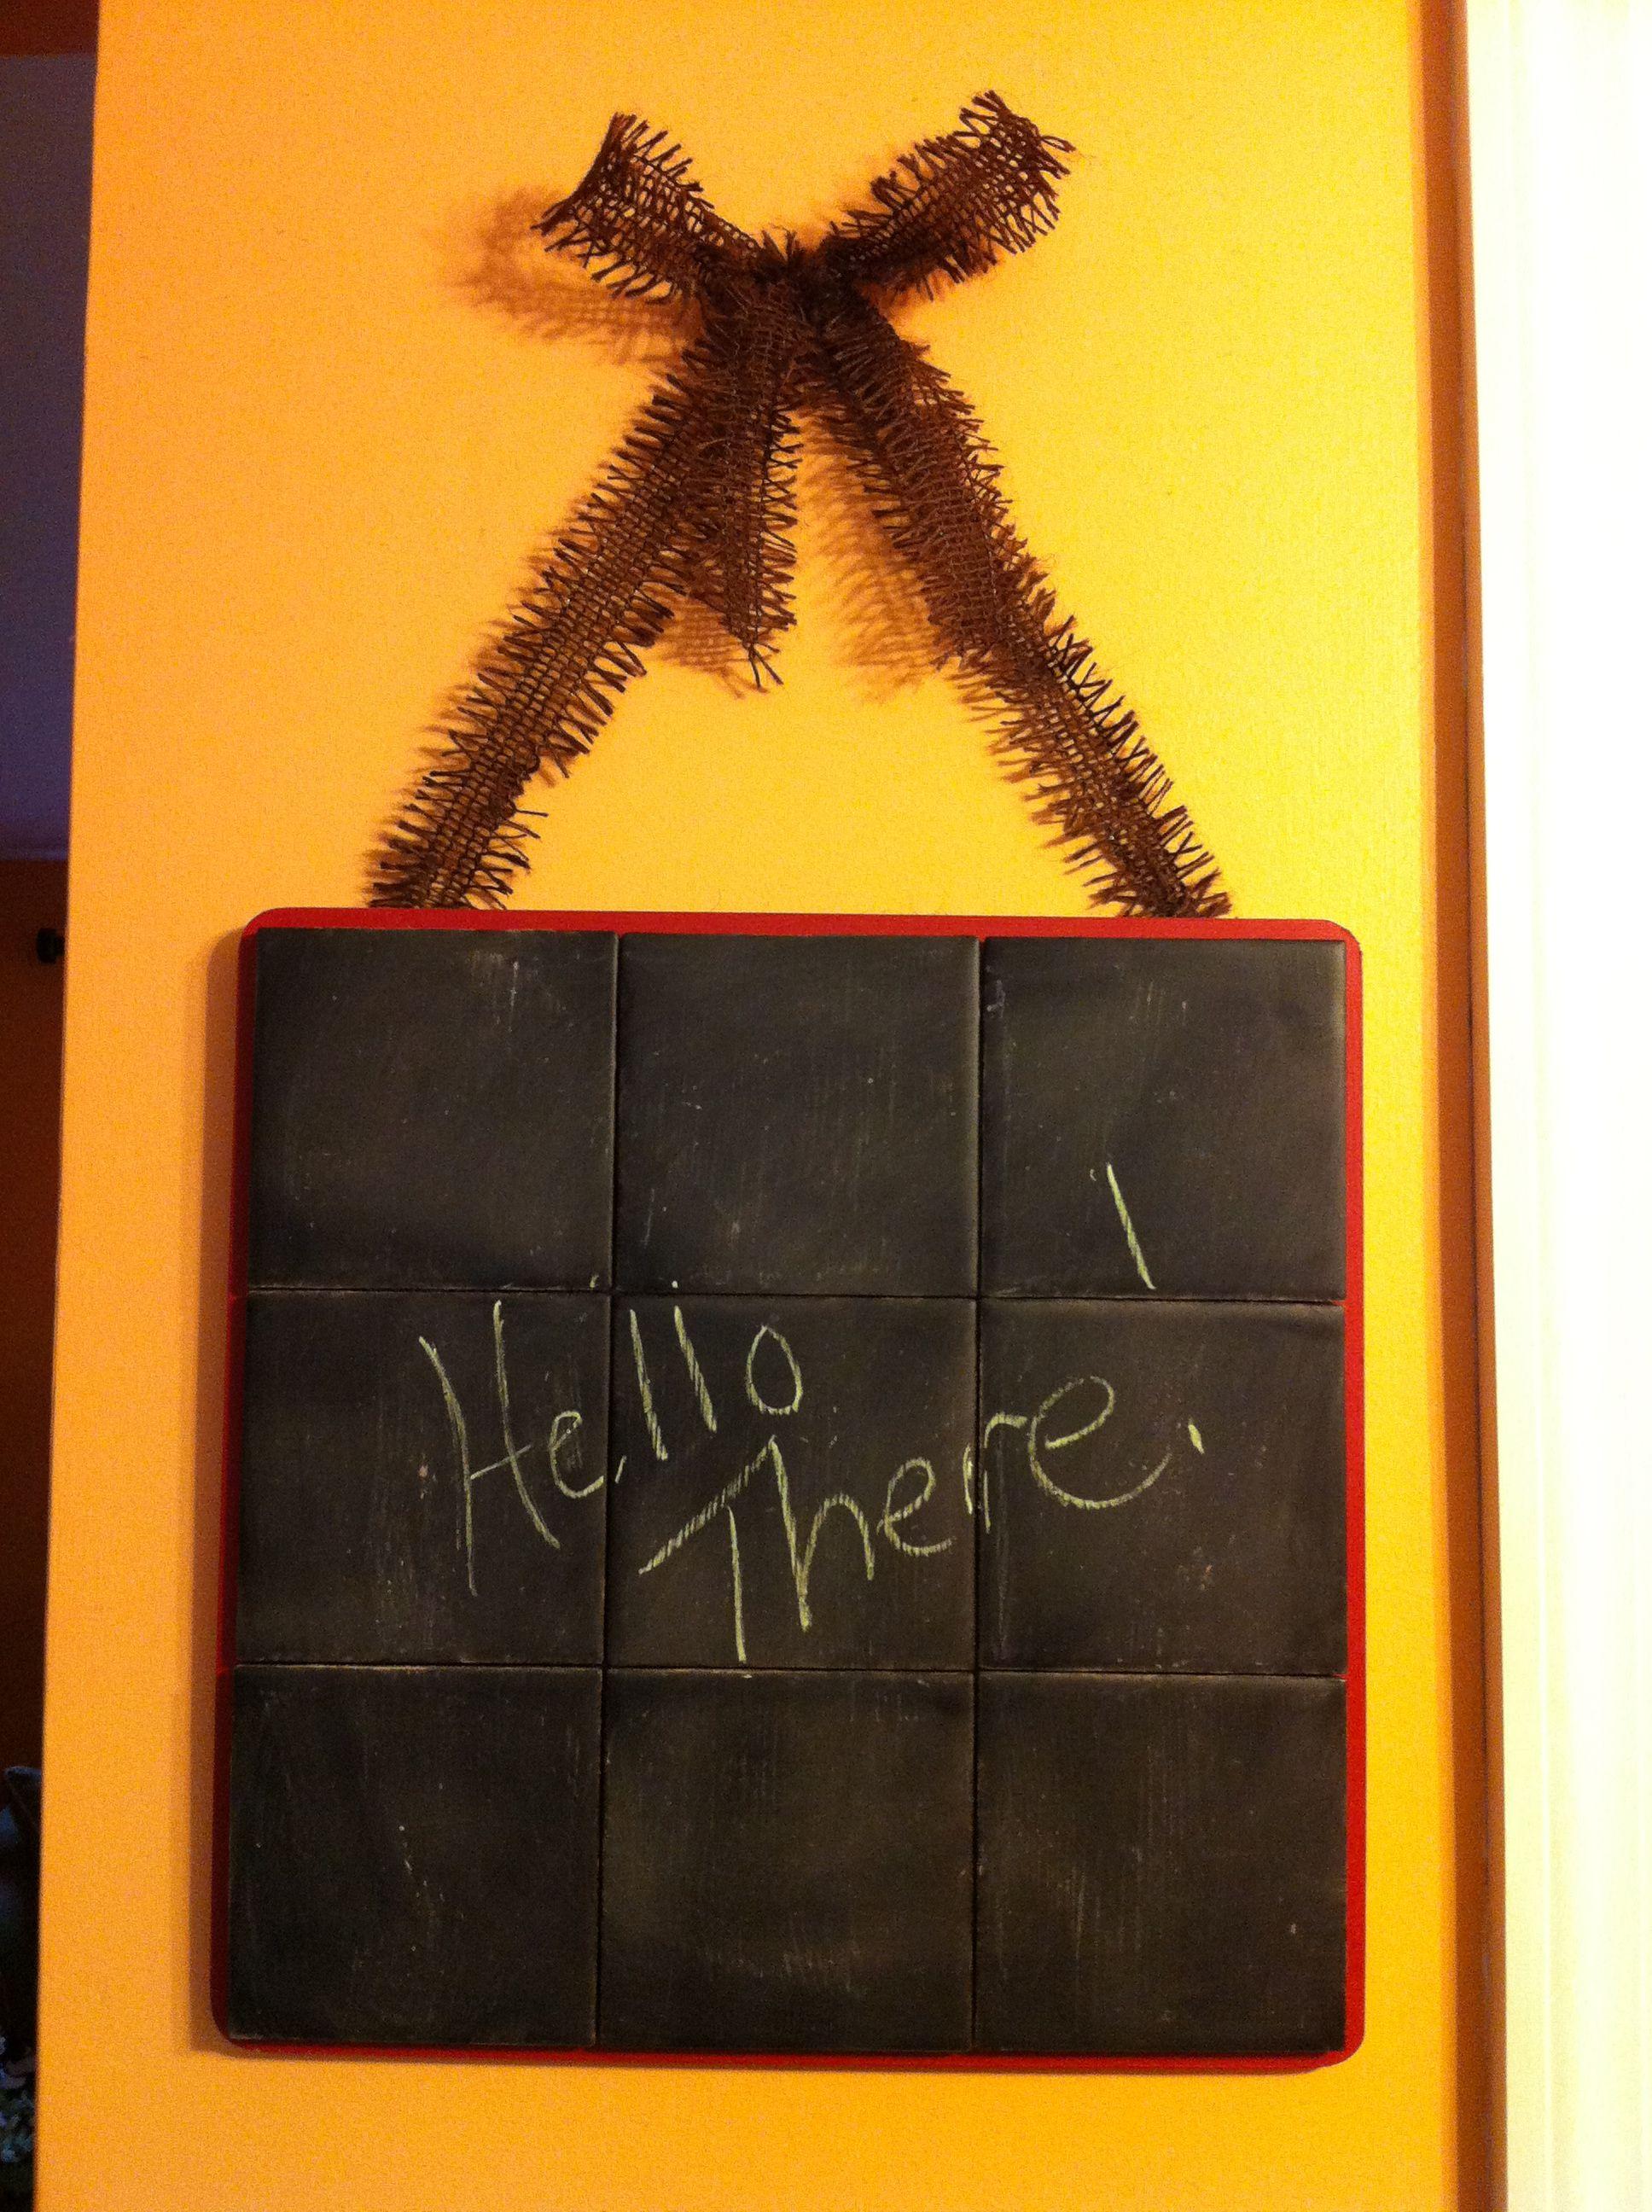 Kitchen tile chalkboard.